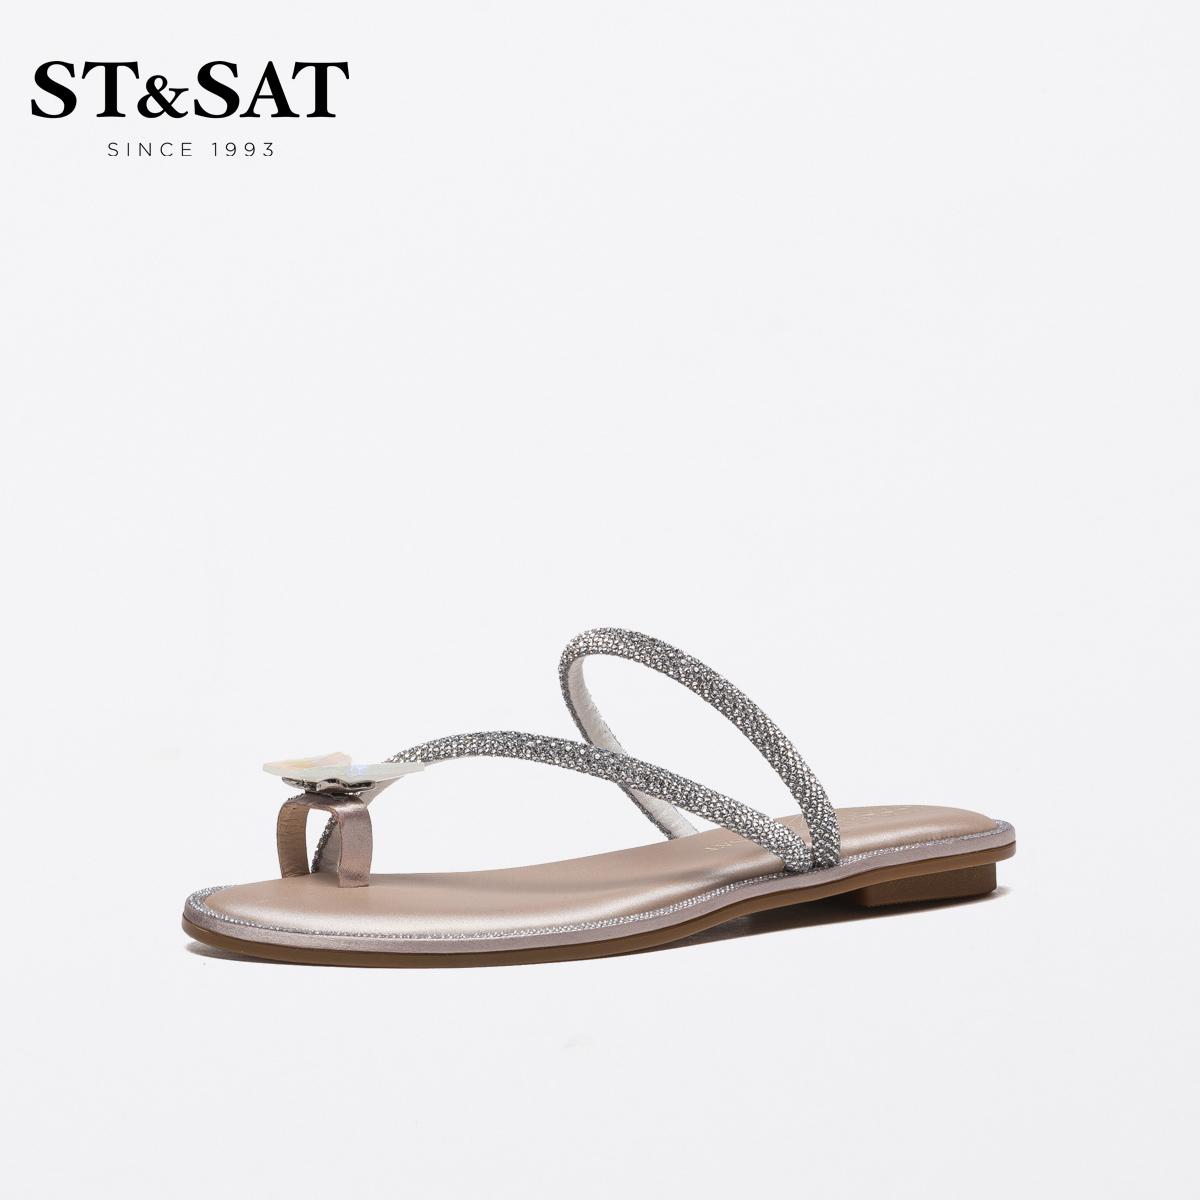 SS12110490 夏季新款蝴蝶结装饰甜美外穿凉拖女 2021 星期六低跟拖鞋